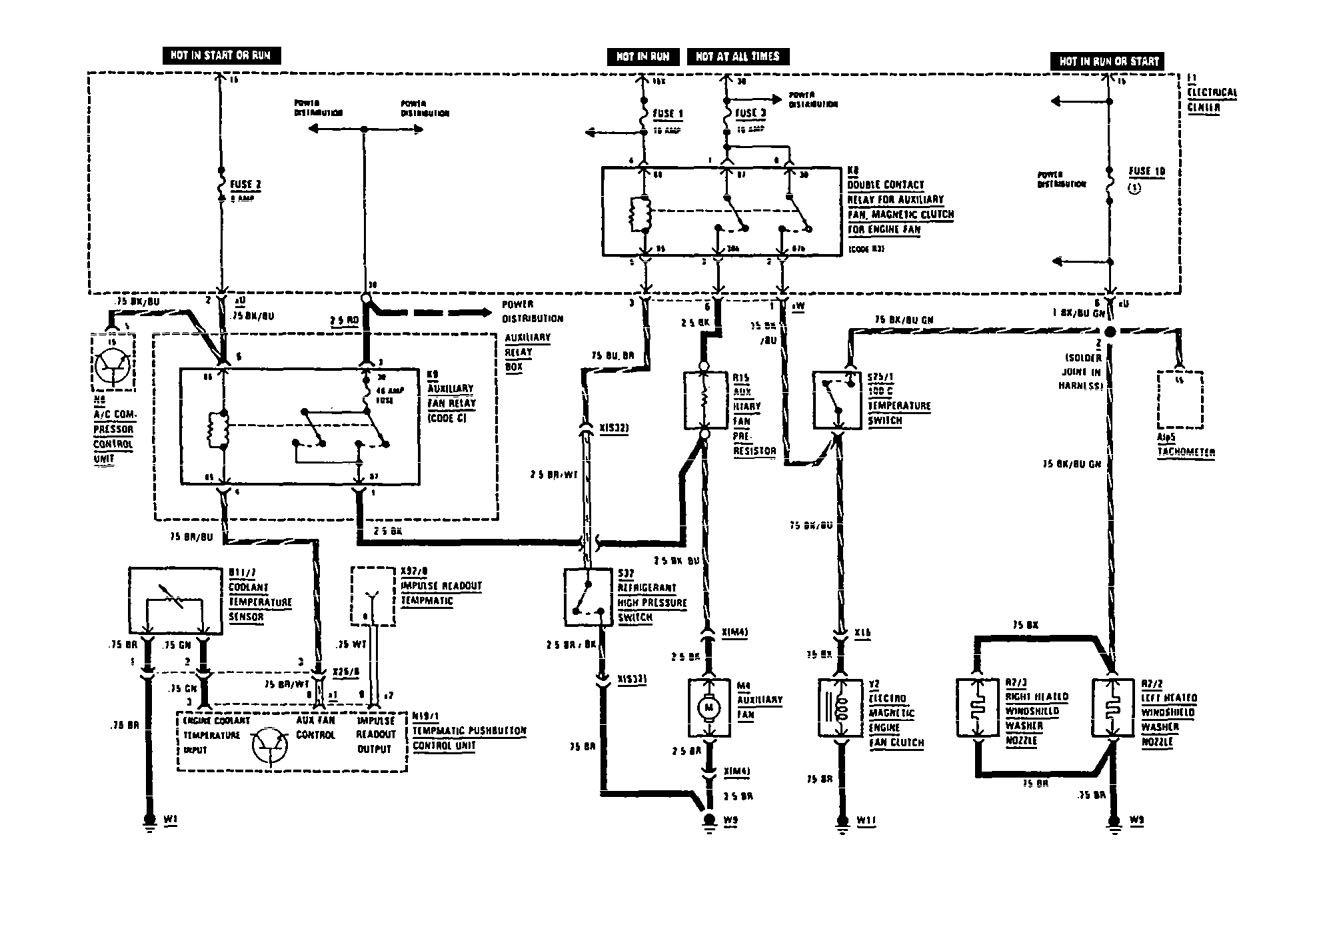 Mercedes Benz 190e 1991 Wiring Diagrams Cooling Fans Diagram